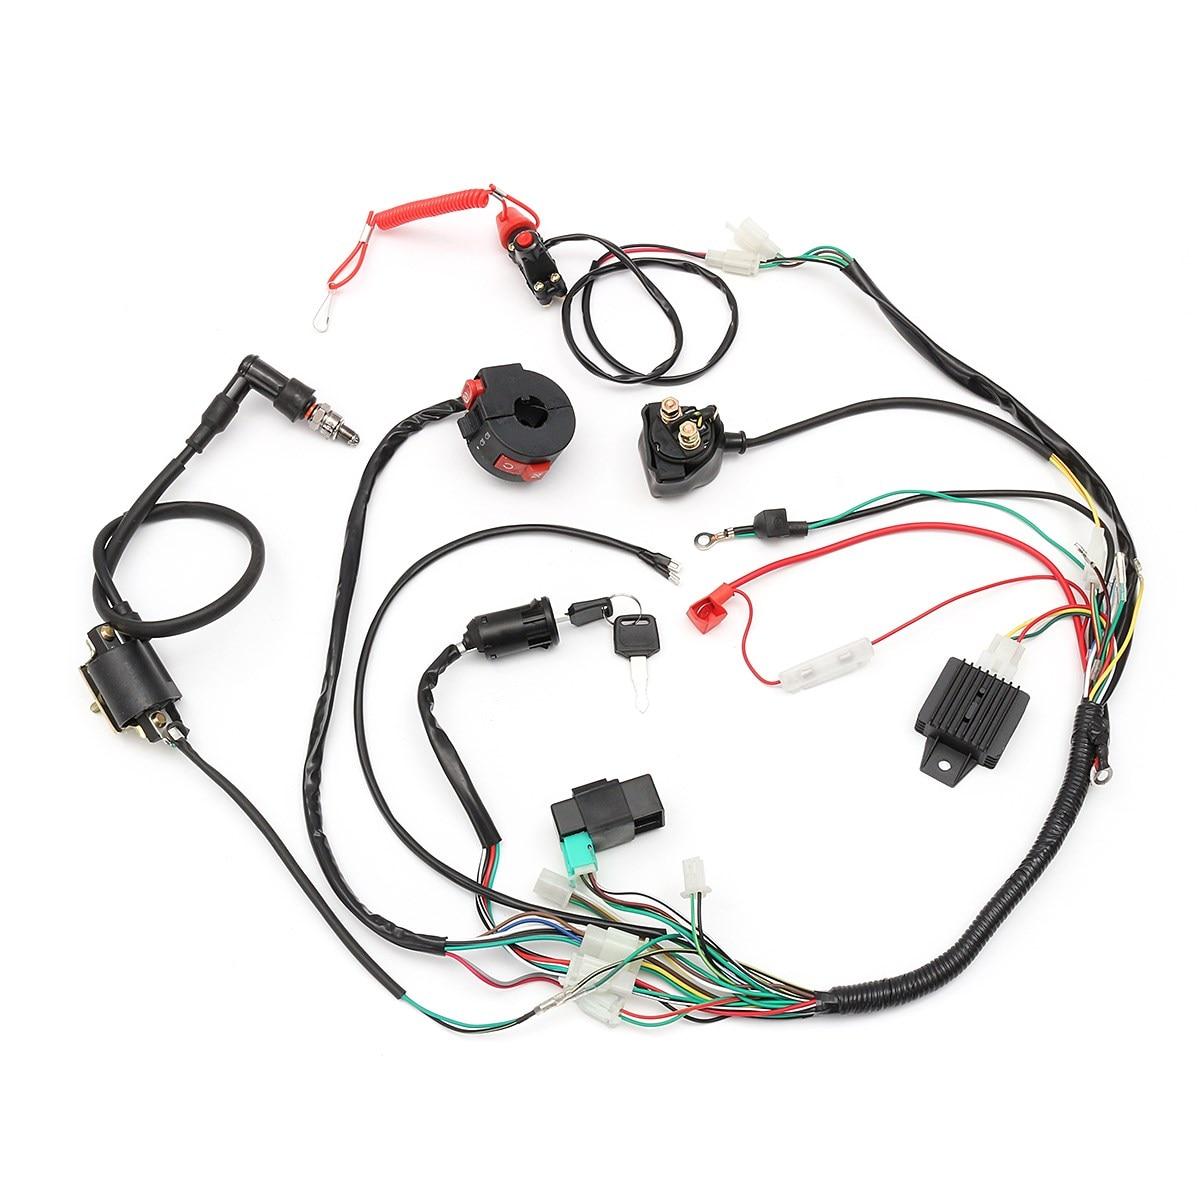 cdi engine start harness set wiring harness loom solenoid